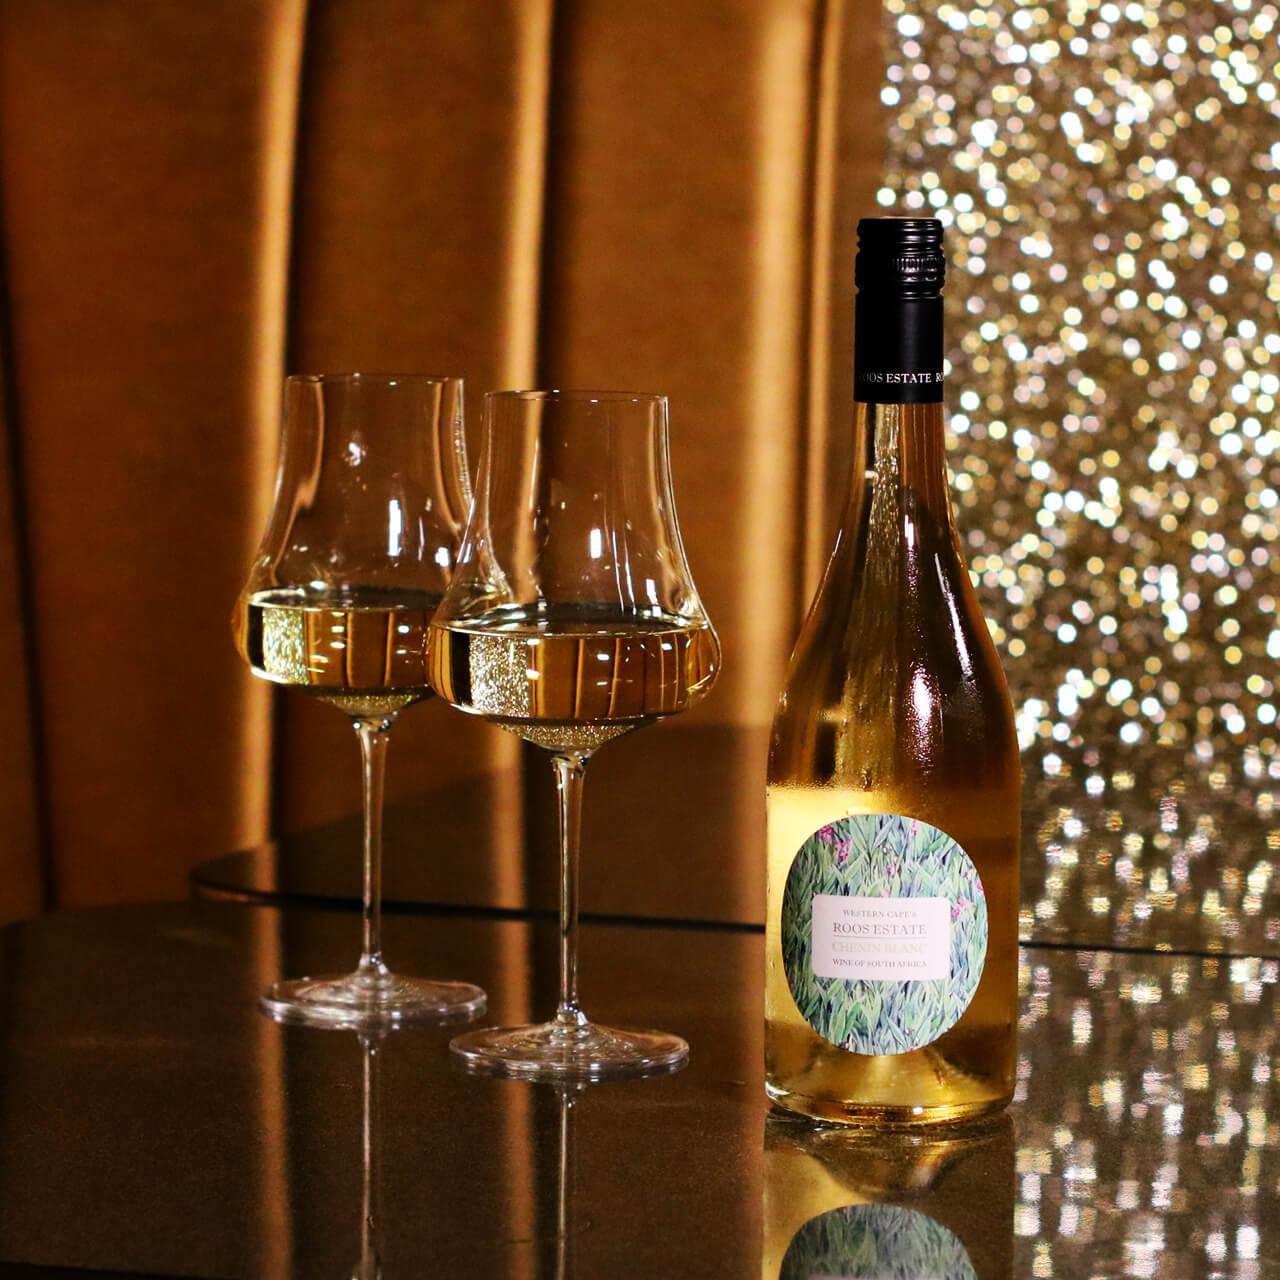 Roose Estate Chenin Blanc - Frankies Wine Bar